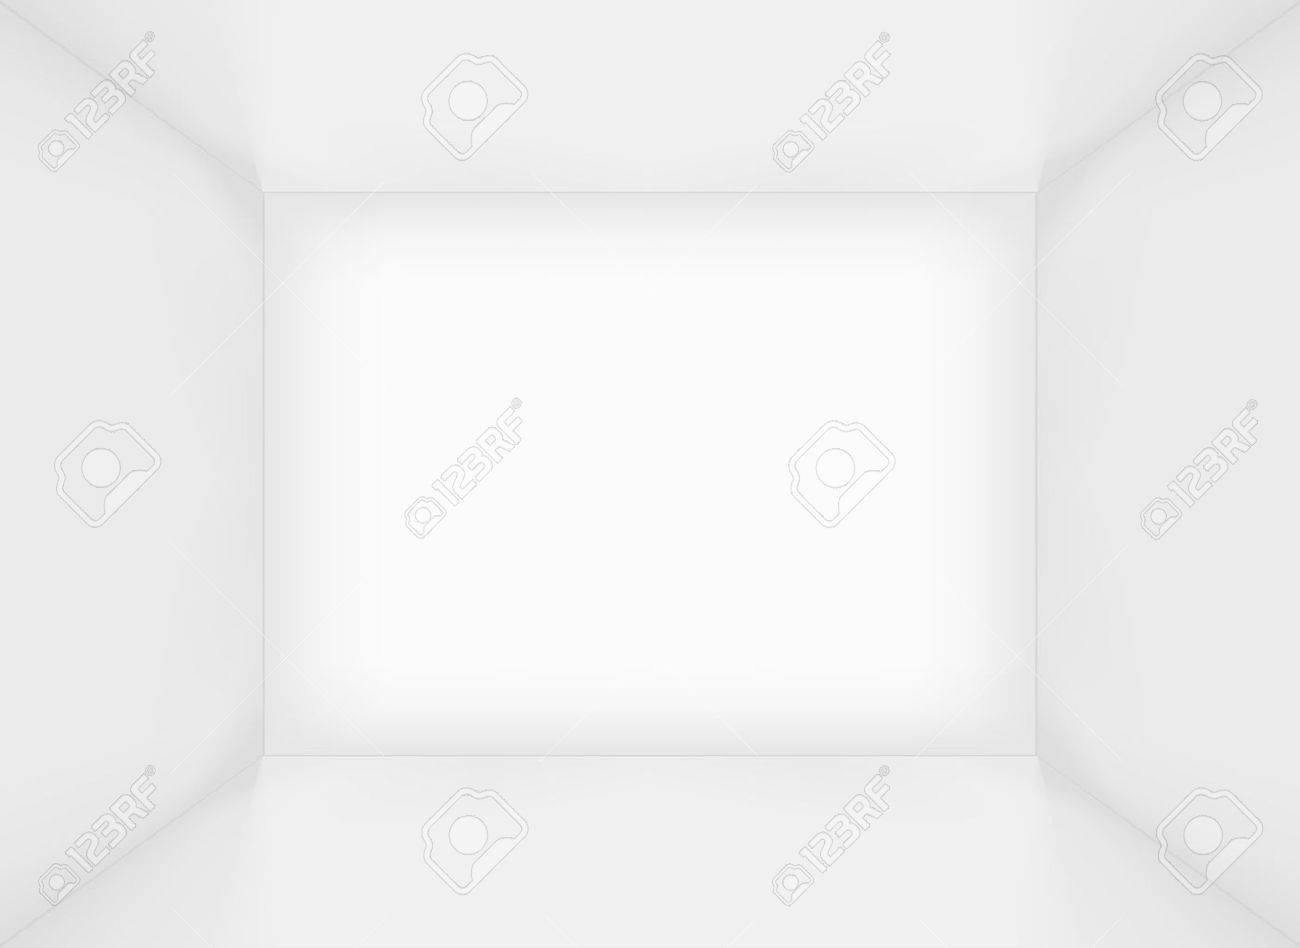 White simple empty rectangle room interior or box - 16884445